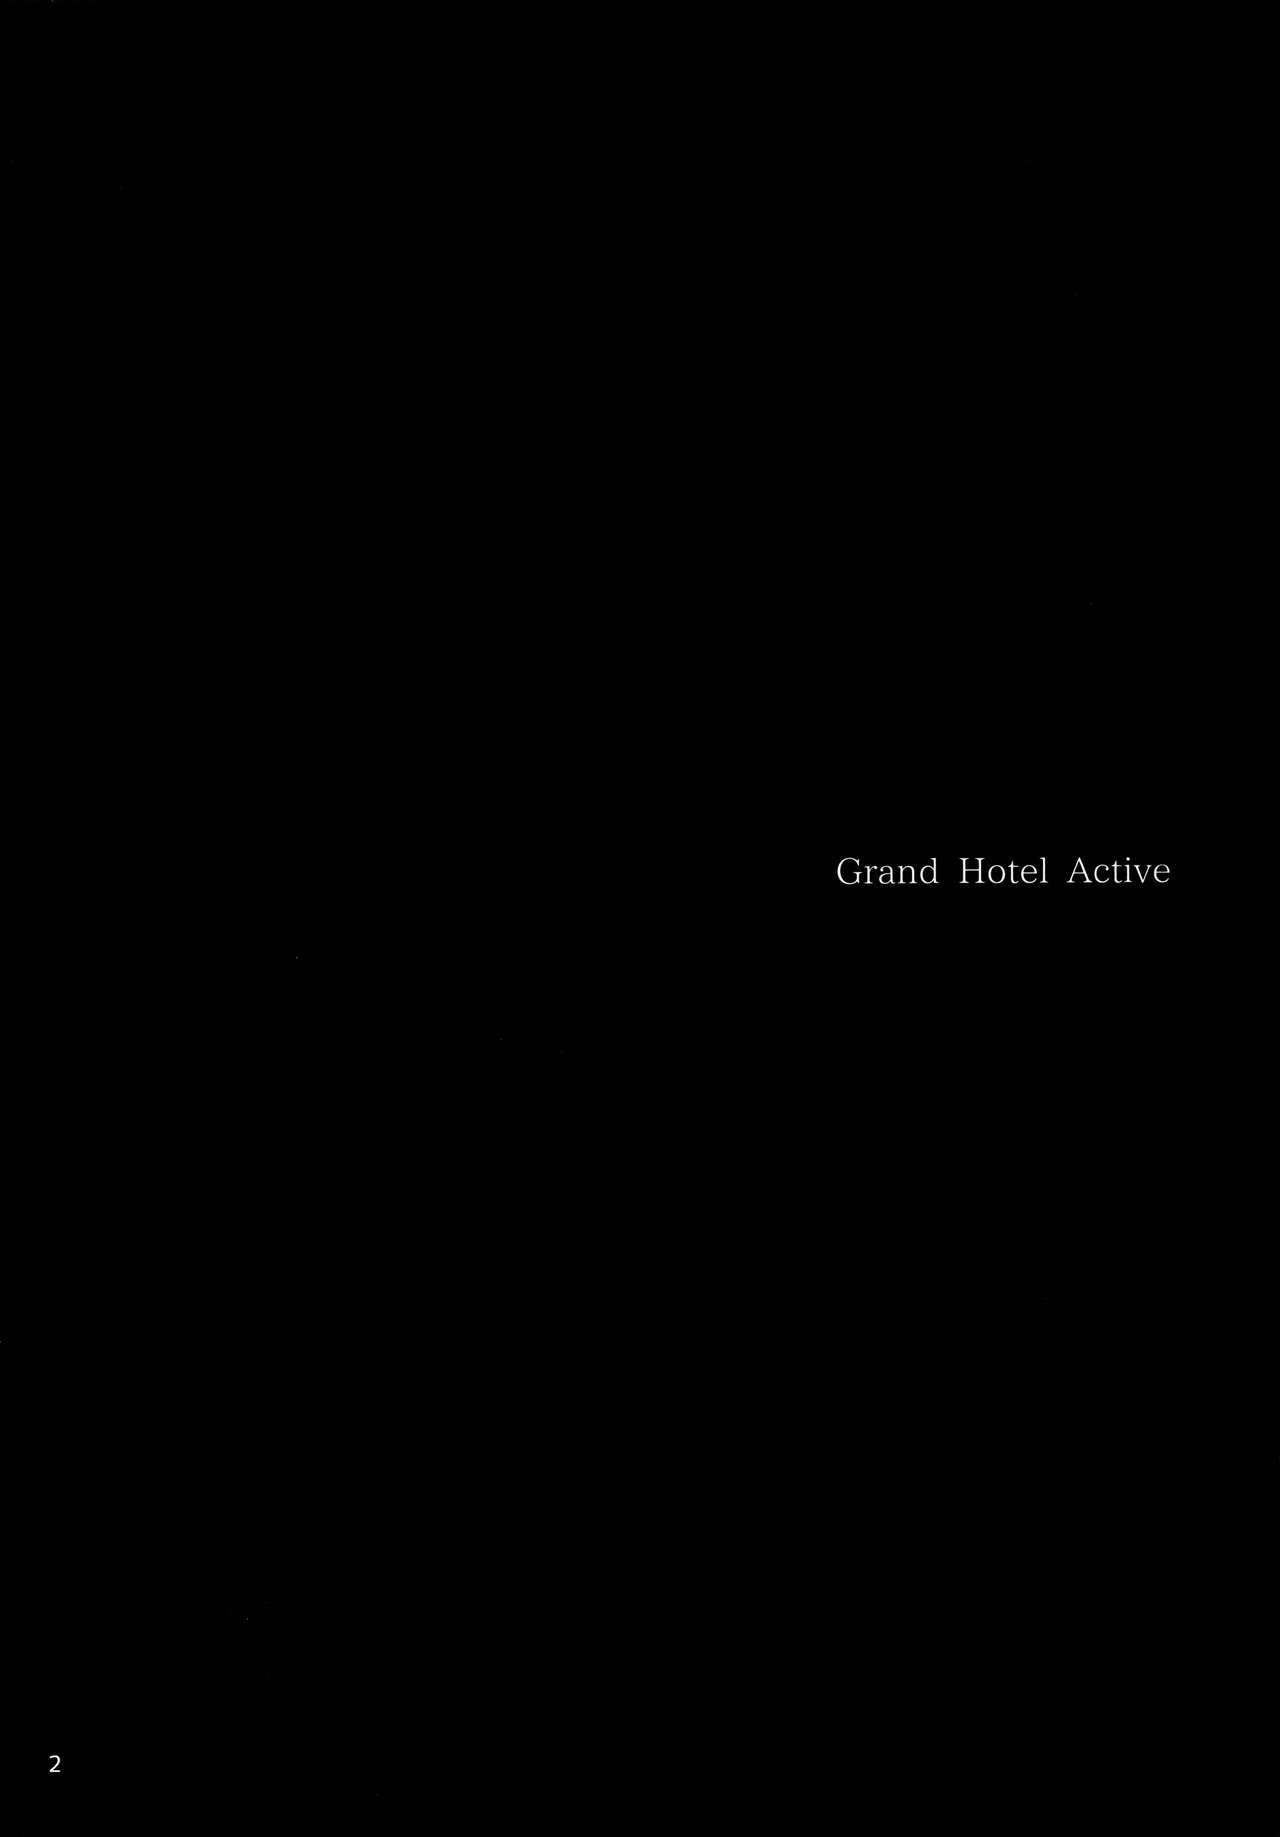 Grand Hotel Active 2